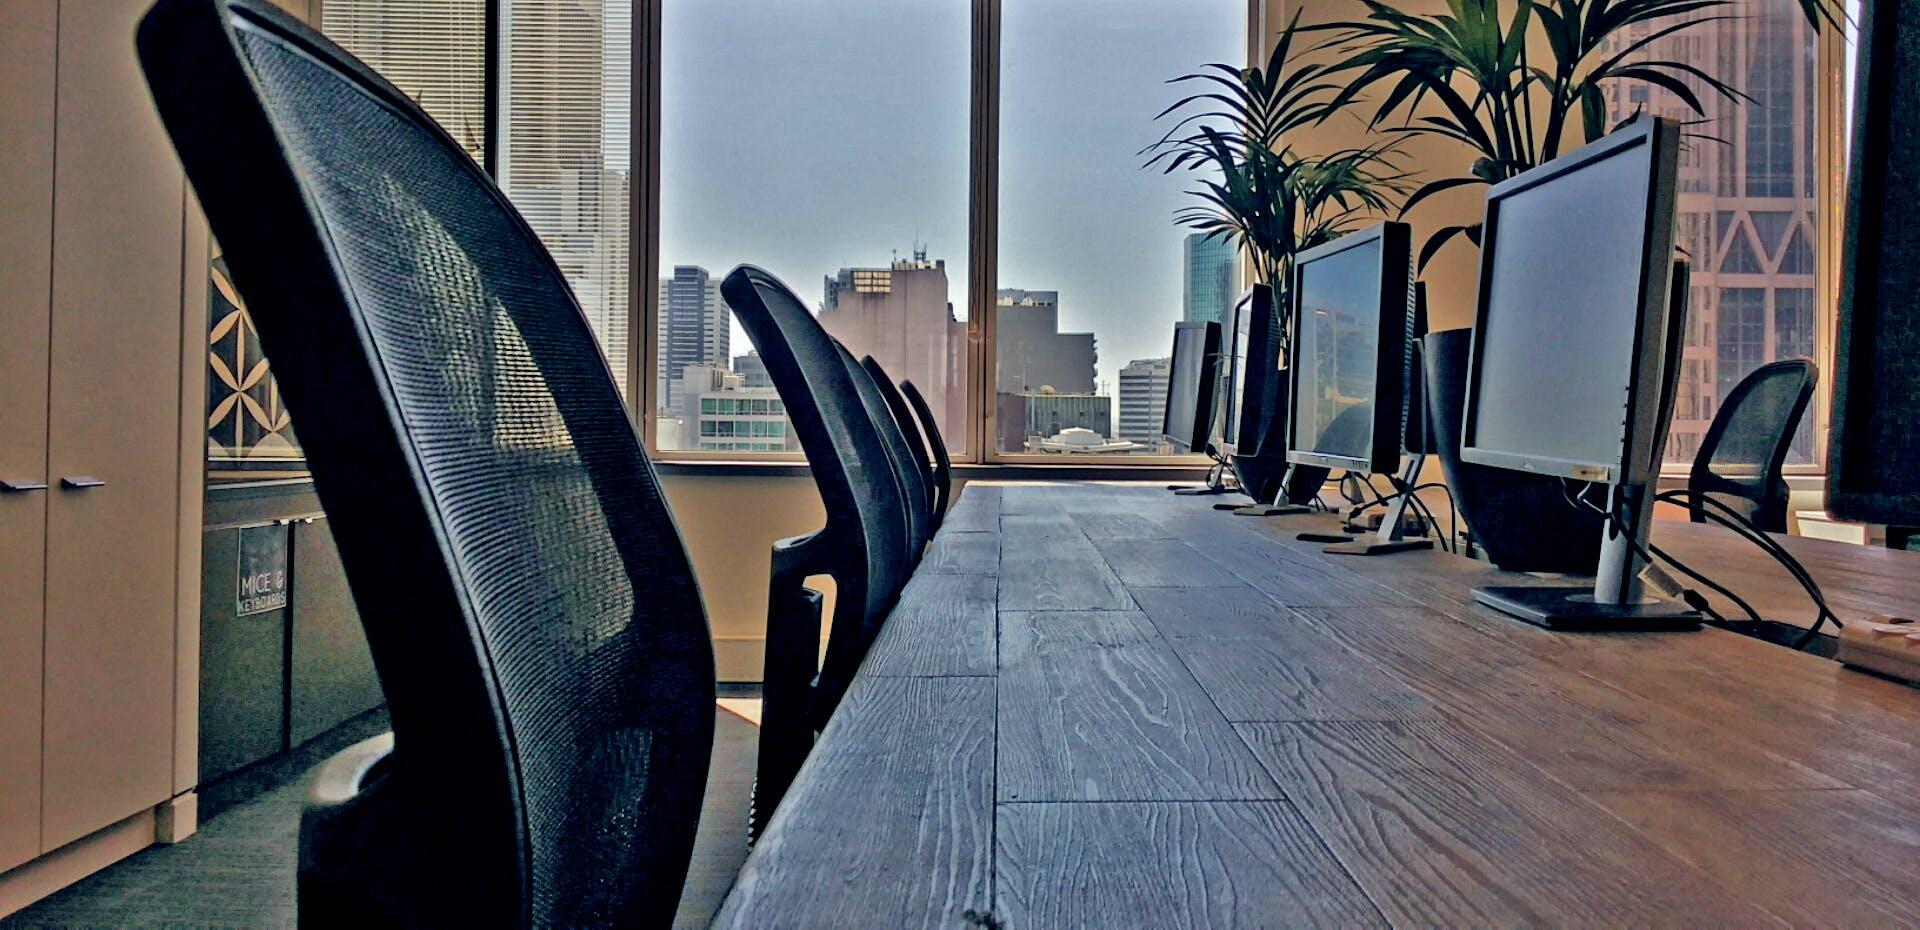 Hot desk at The Cluster, image 3